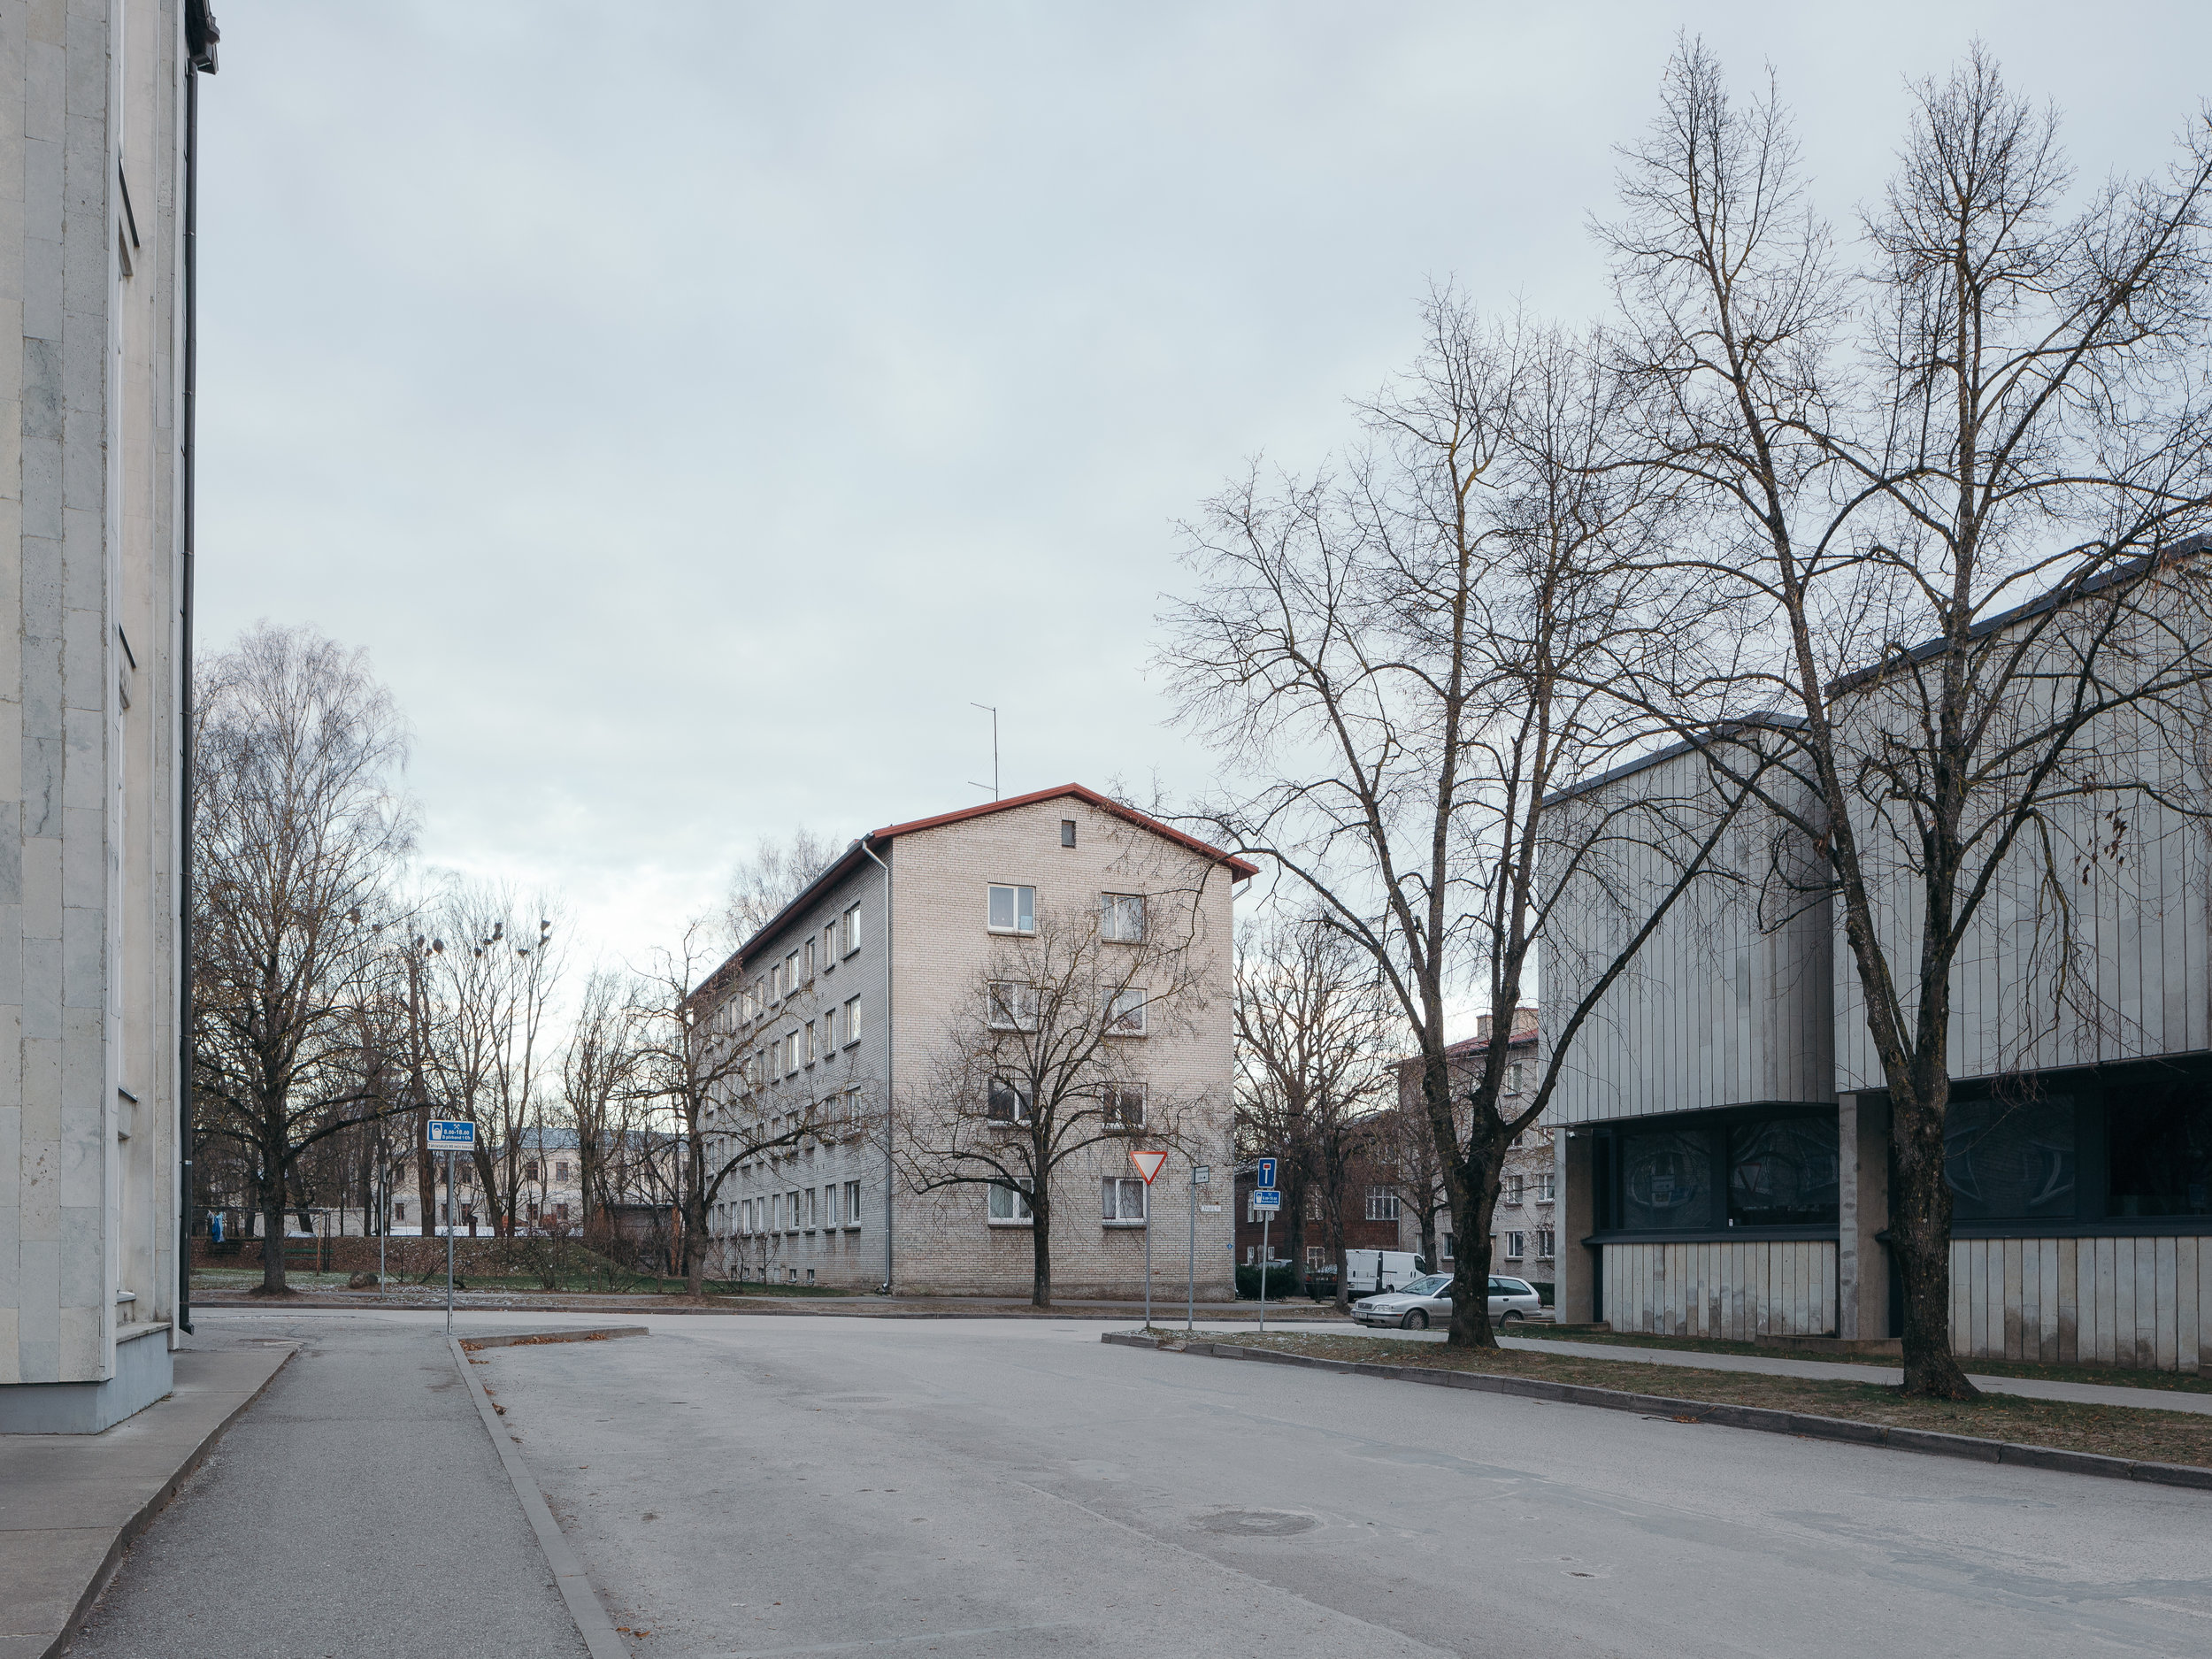 Tartu, Estonia, December 2018